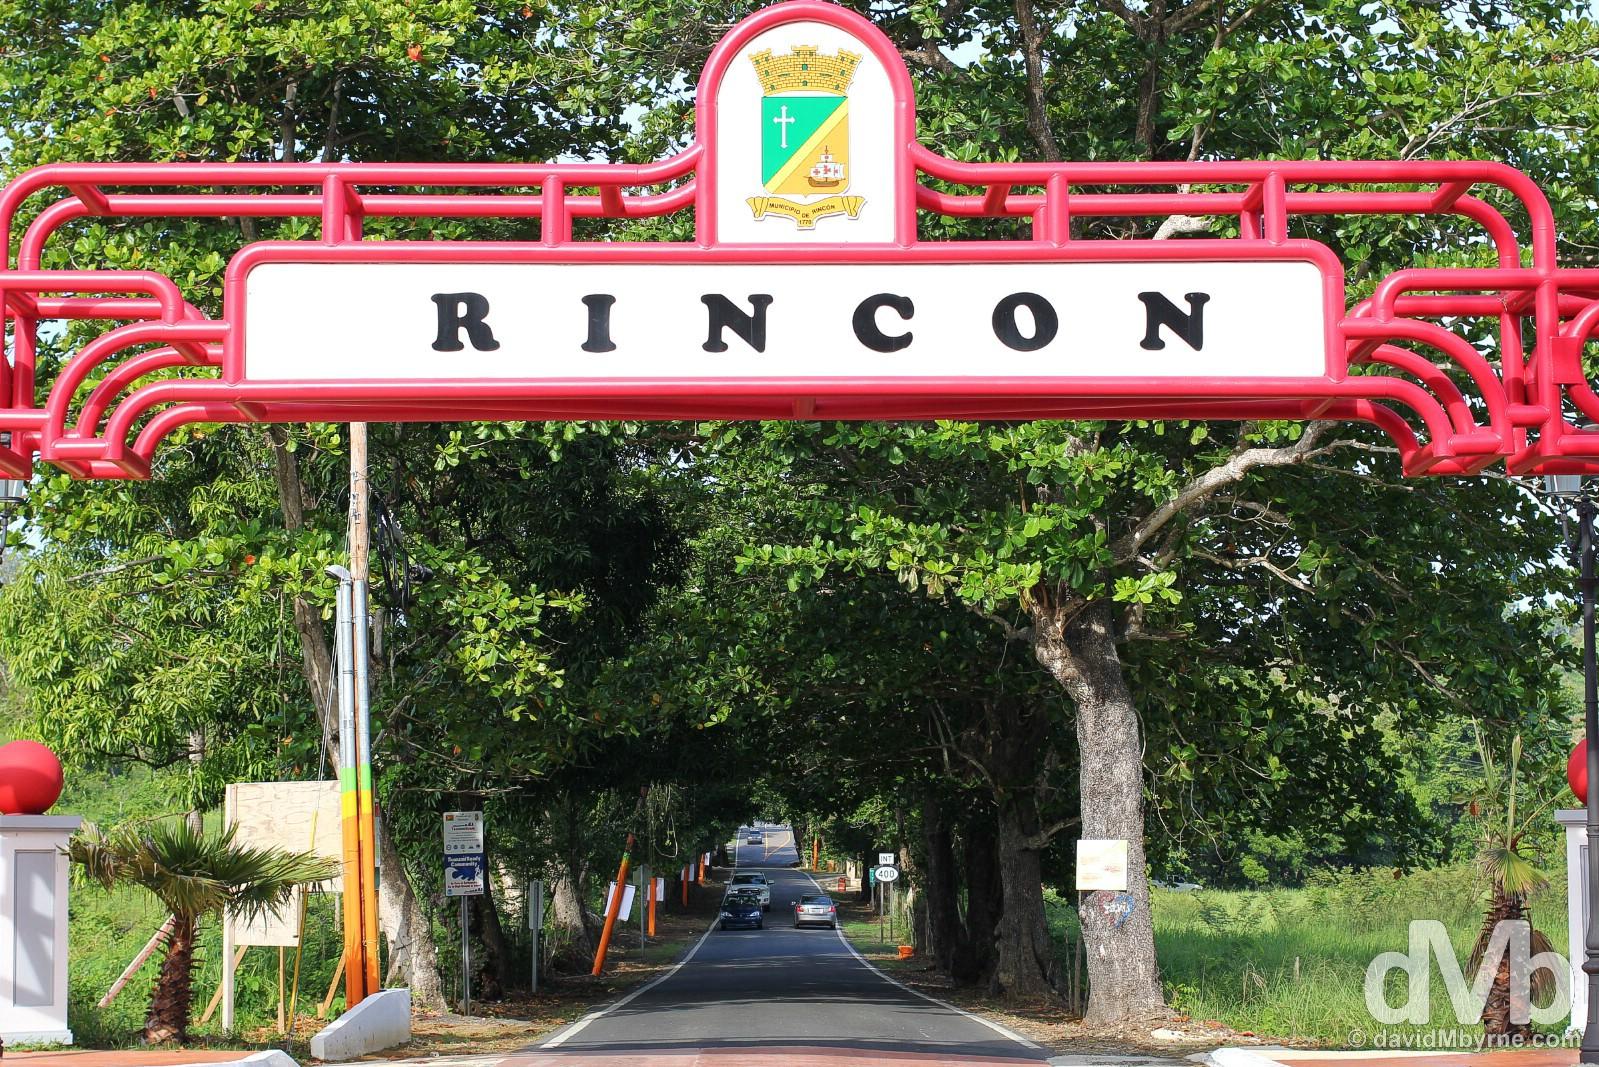 Rincon, western Puerto Rico, Greater Antilles. June 4, 2015.